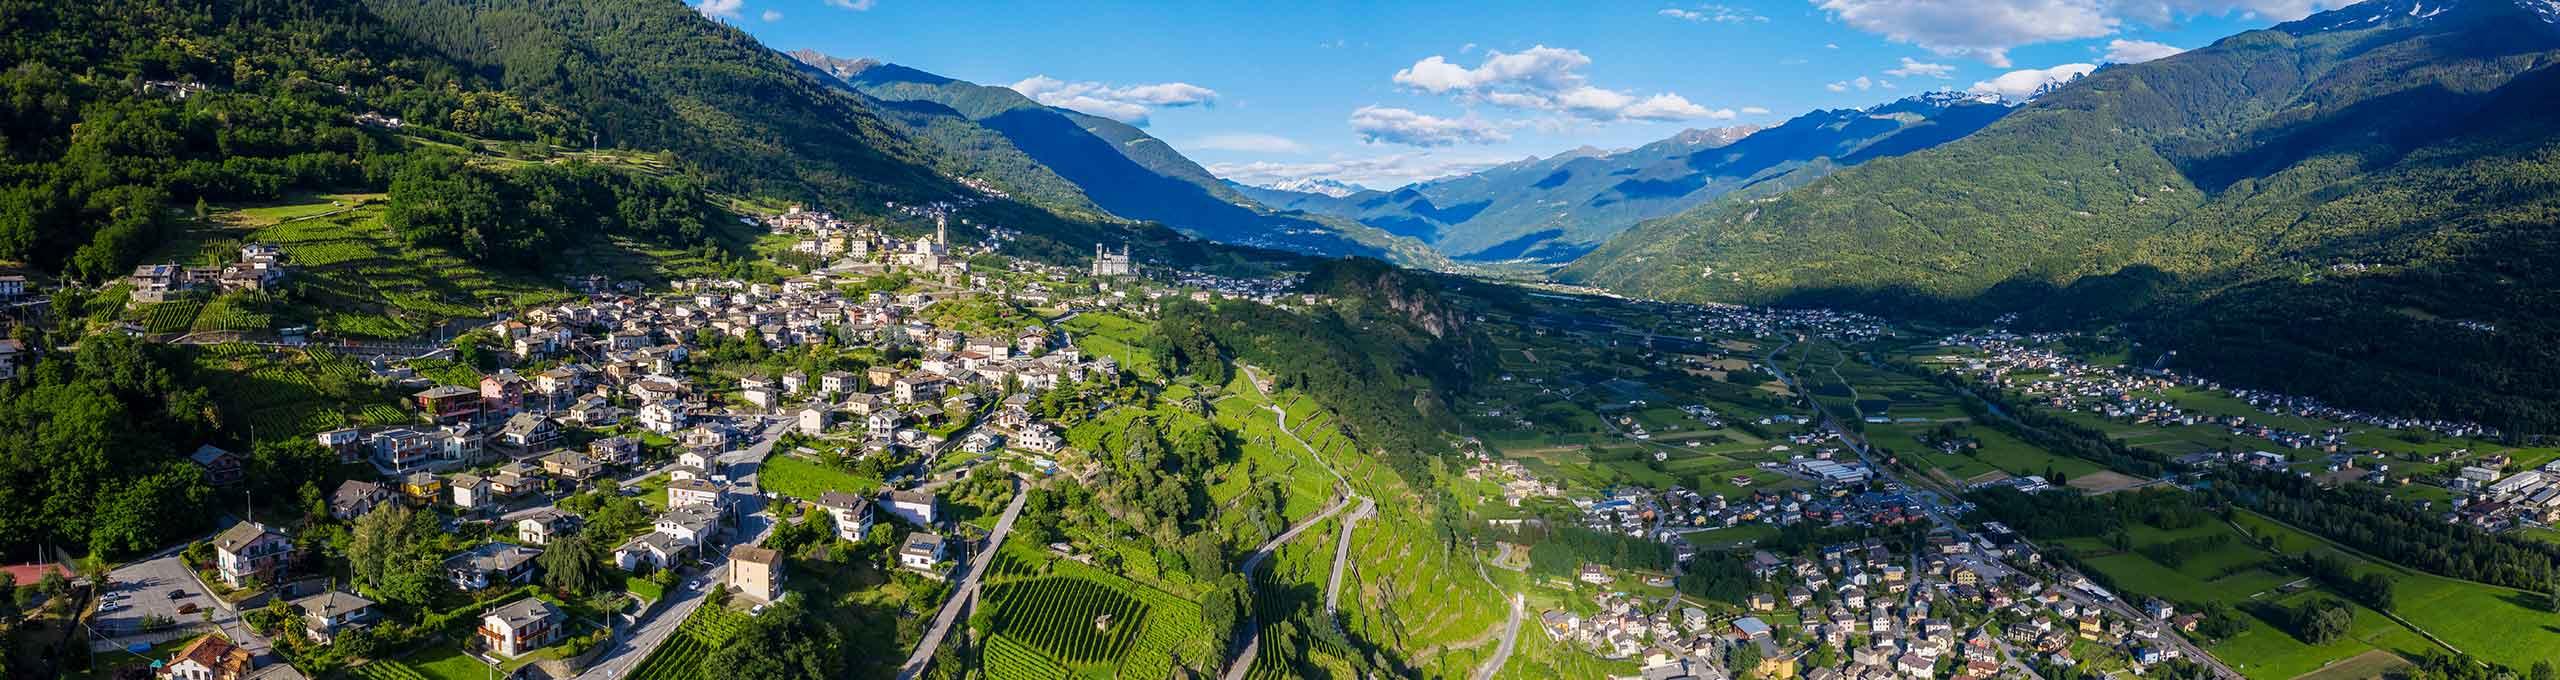 Poggiridenti, Valtellina